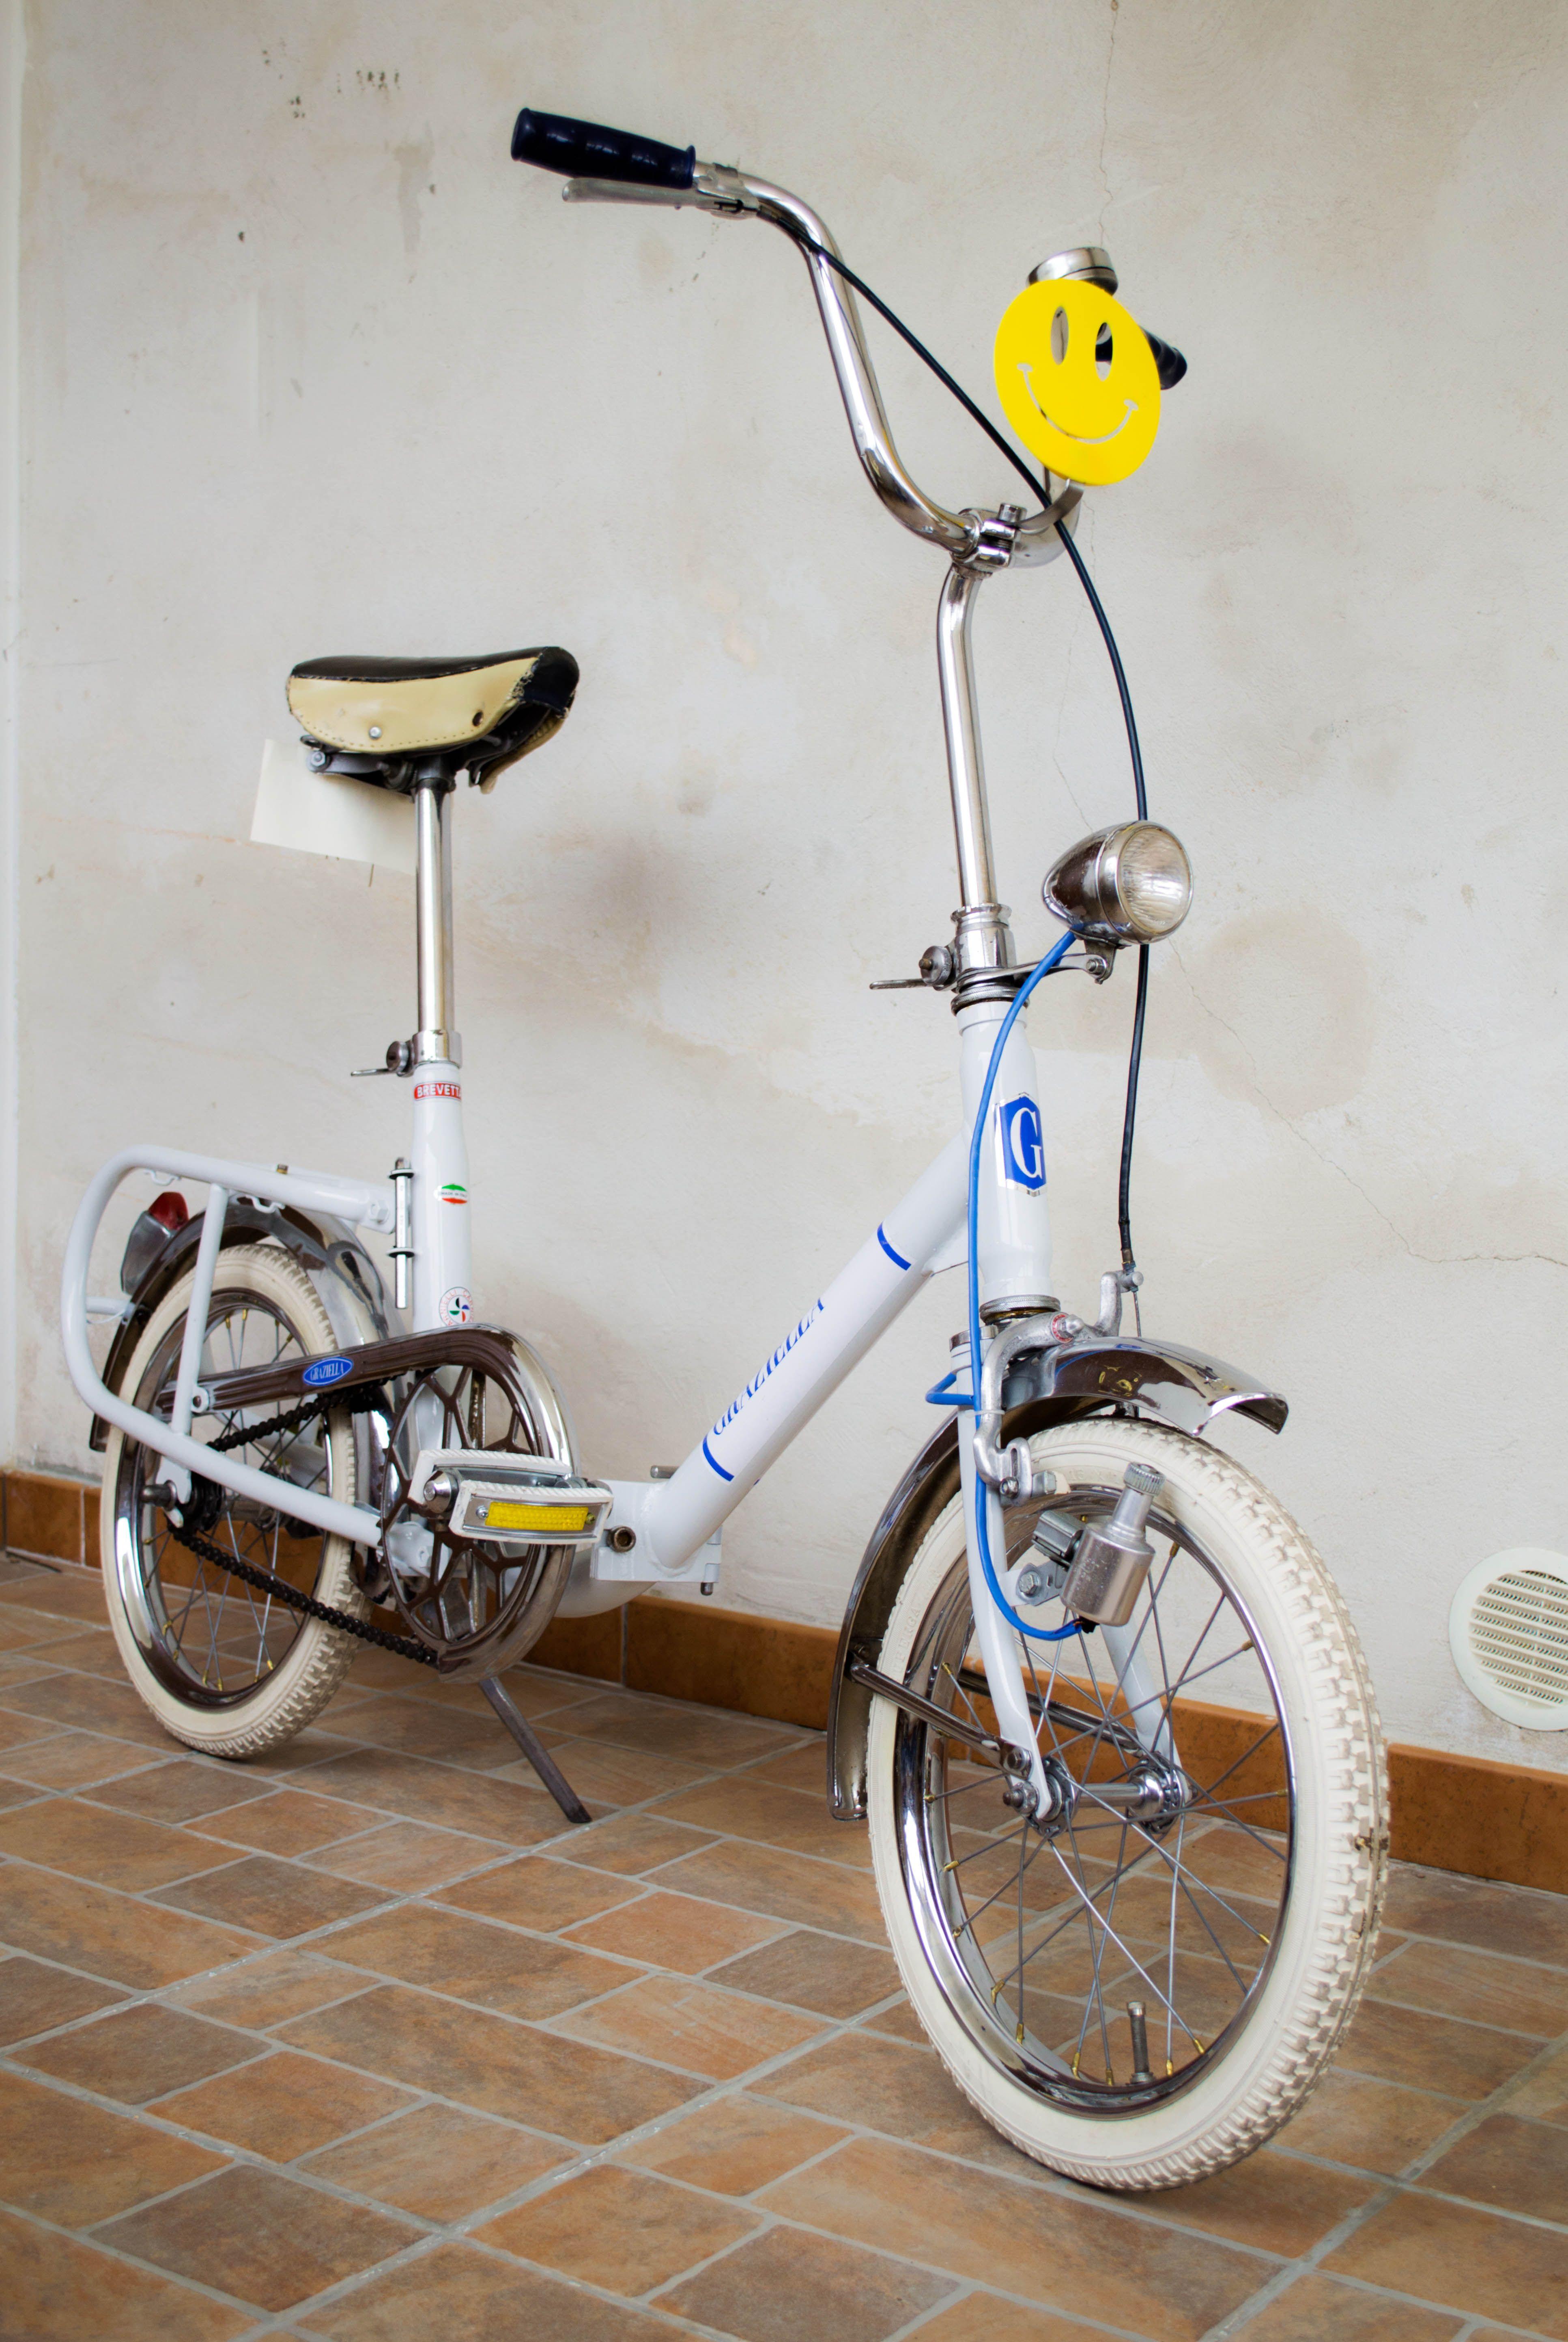 Graziella Carnielli Ruote 16 Bianca Contropedale Biciclette D